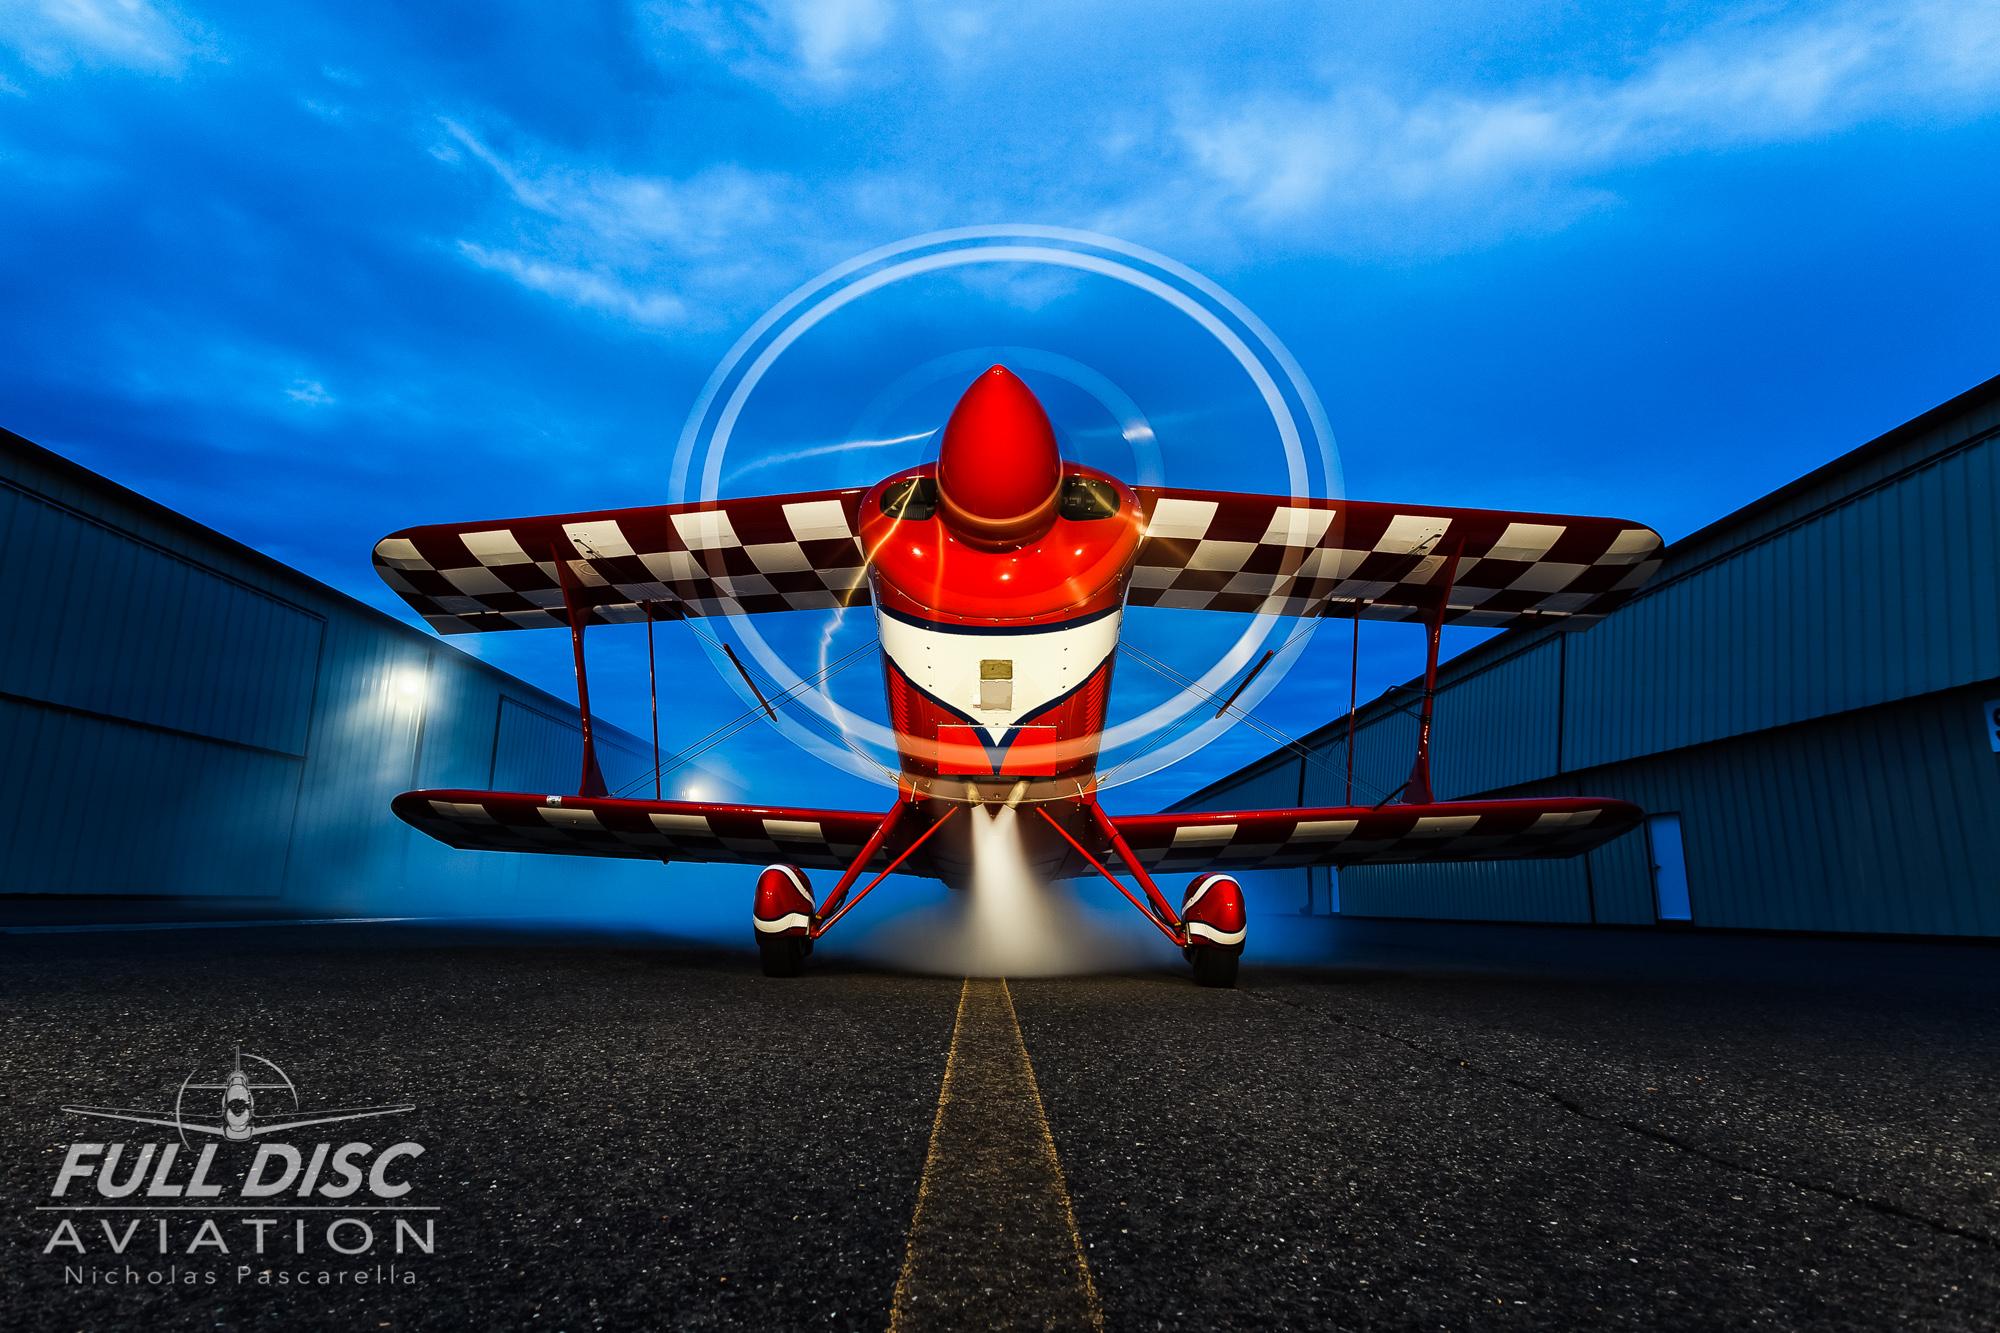 nickpascarella_nicholaspascarella_fulldiscaviation_aircraft_messenheimer_pitts.jpg